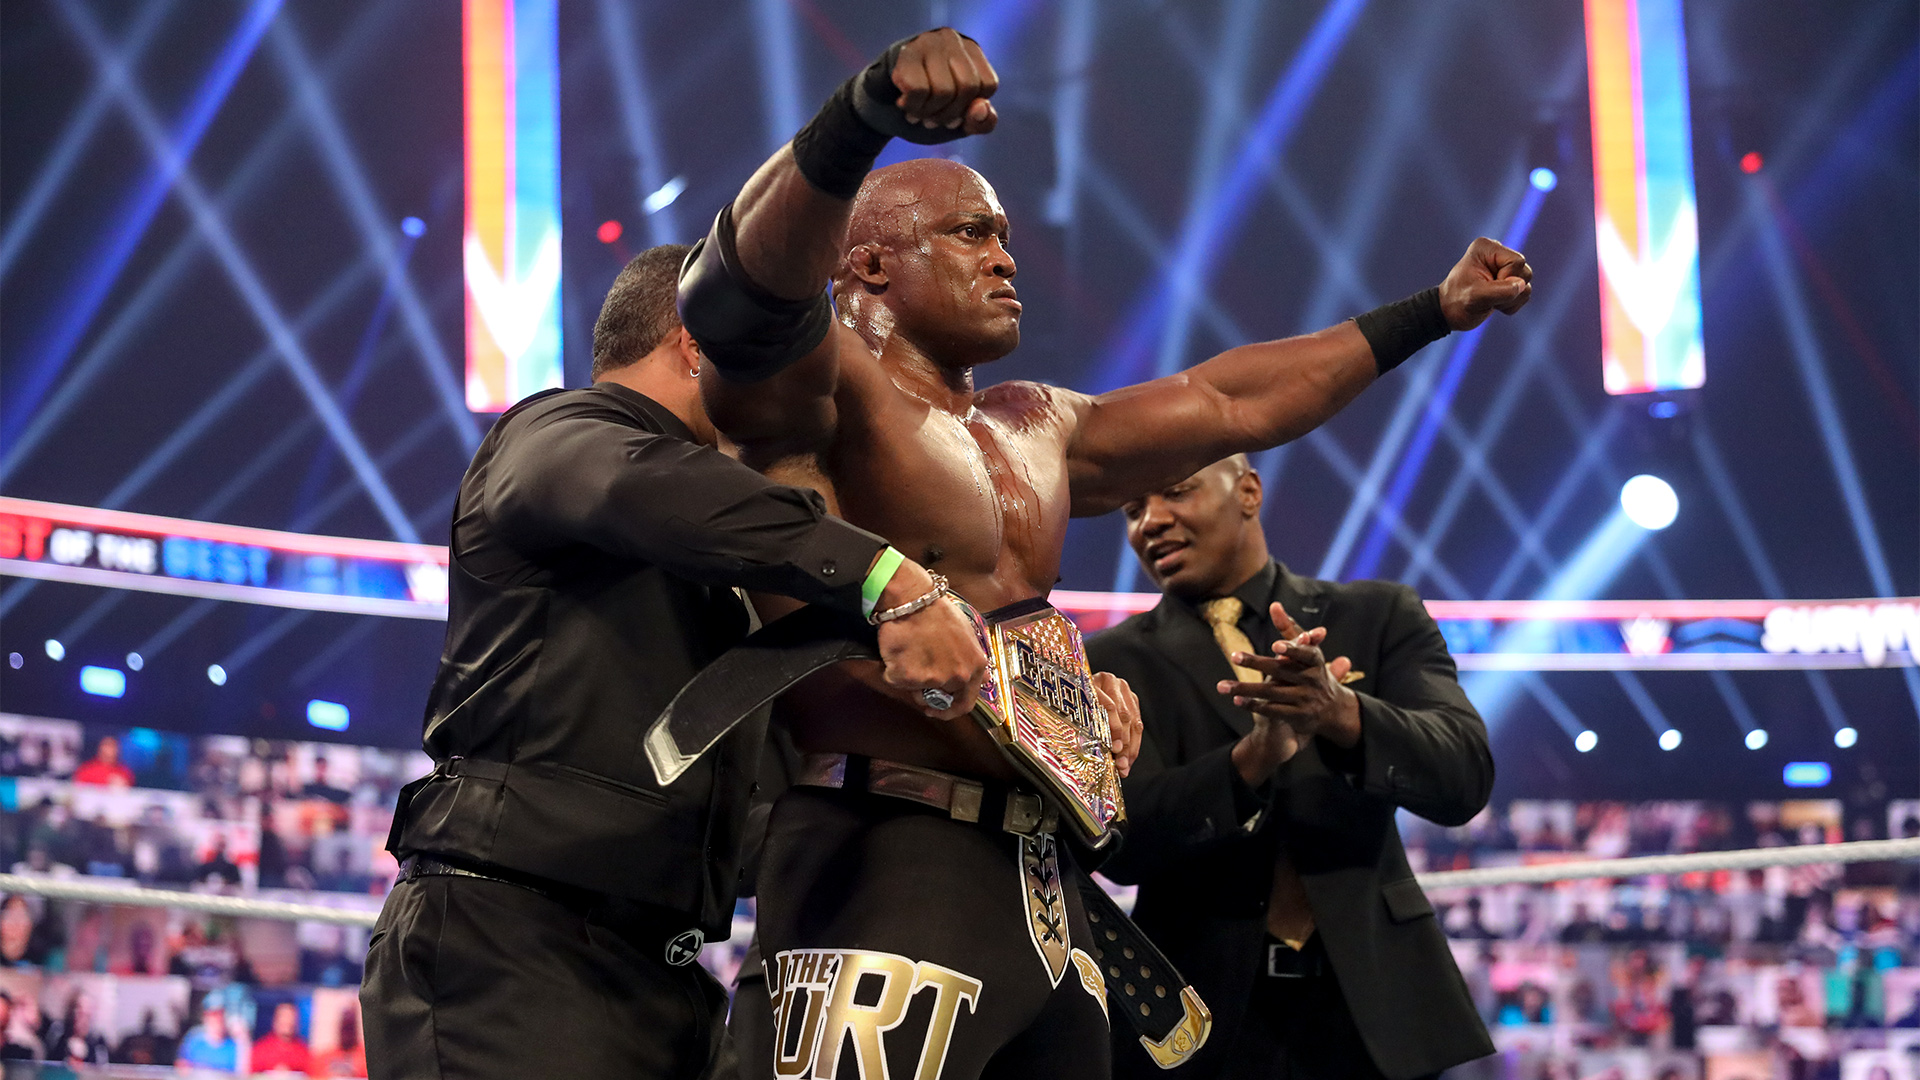 Bobby Lashley domina Sami Zayn e amplia placar para o RAW no Survivor Series